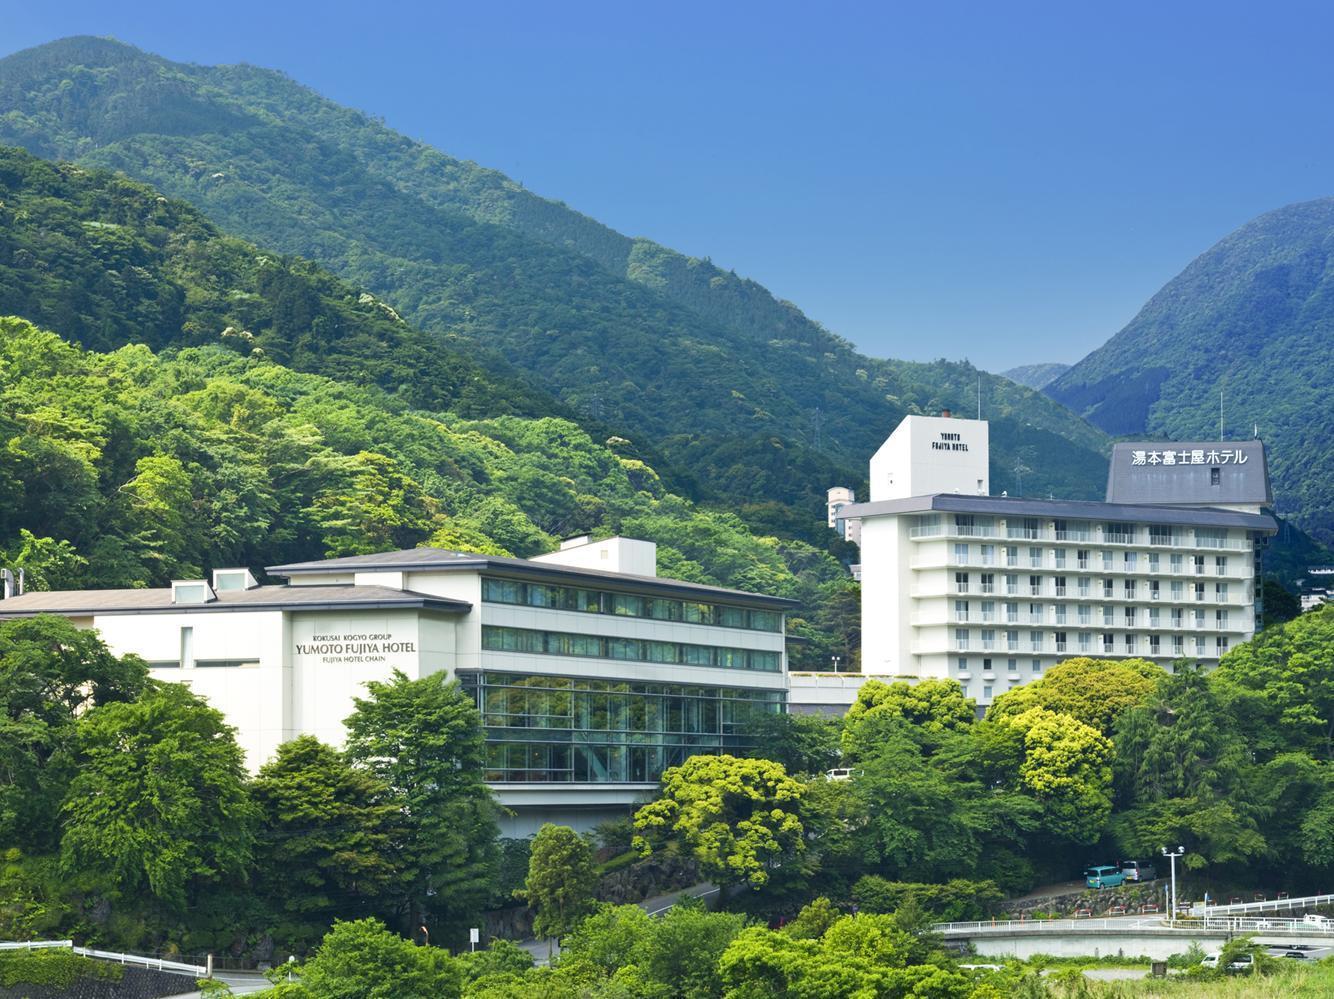 Yumoto Fujiya Hotel Hakone